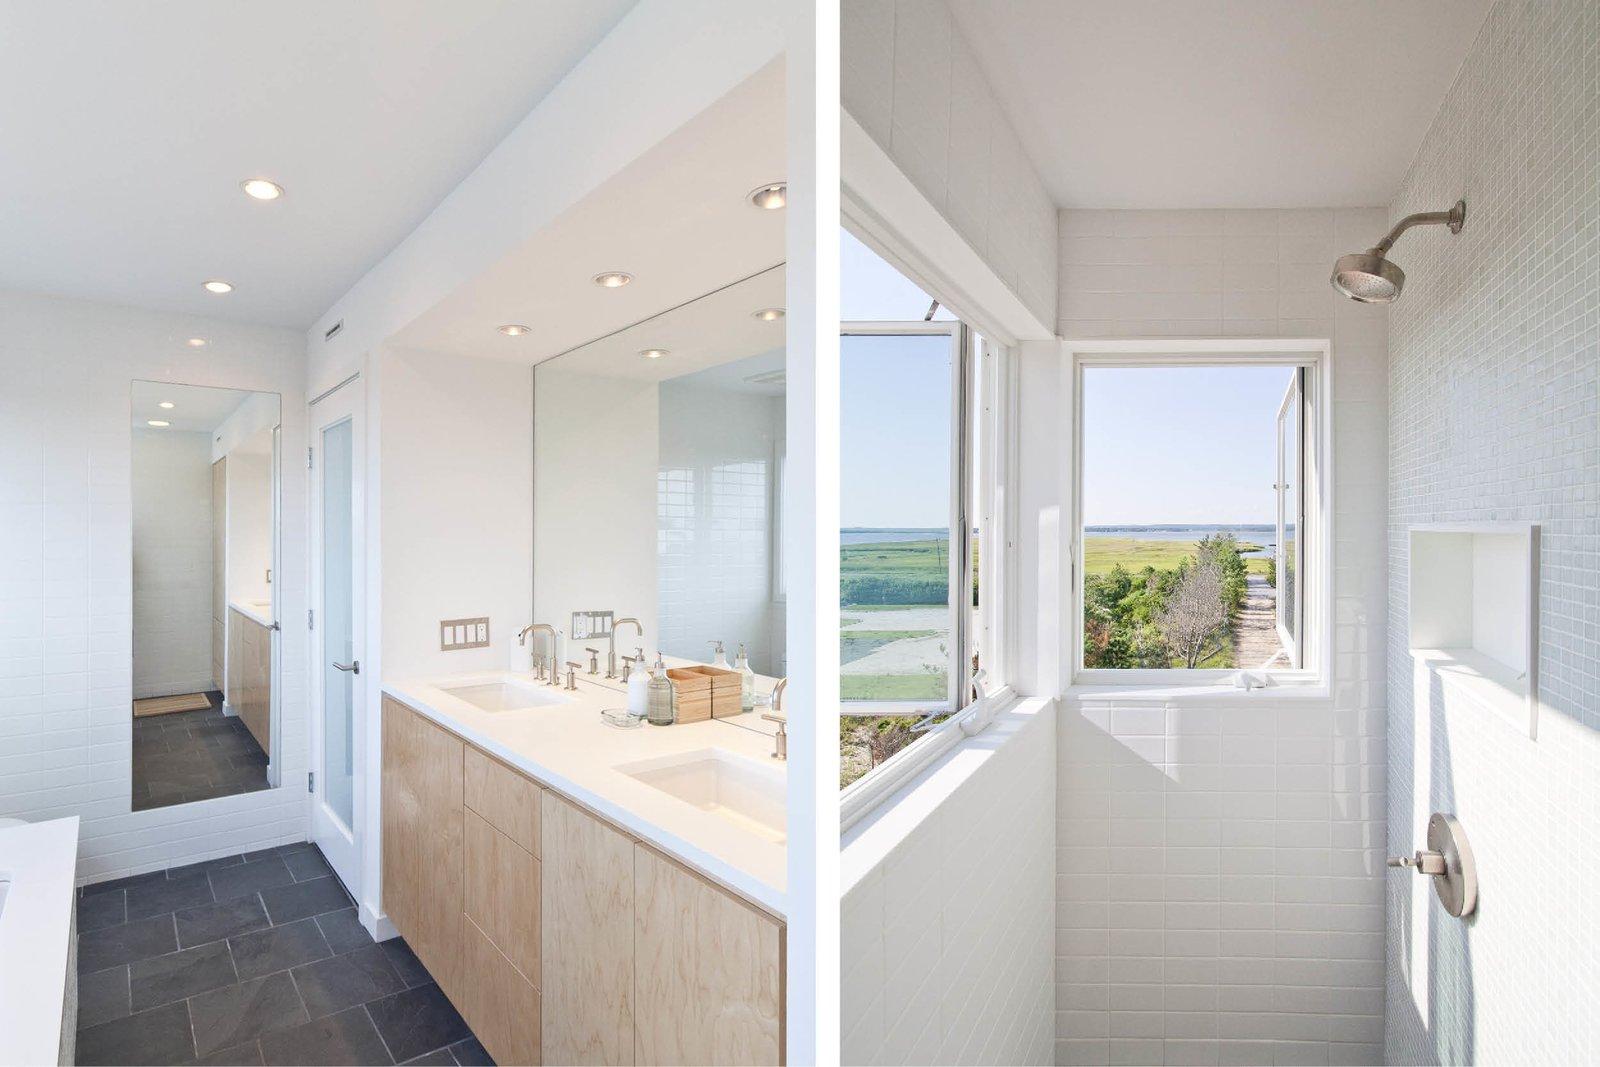 Bath Room, Engineered Quartz Counter, Limestone Floor, Undermount Sink, Ceiling Lighting, Subway Tile Wall, and Corner Shower Master bathroom  Dune Road Beach House by Resolution: 4 Architecture